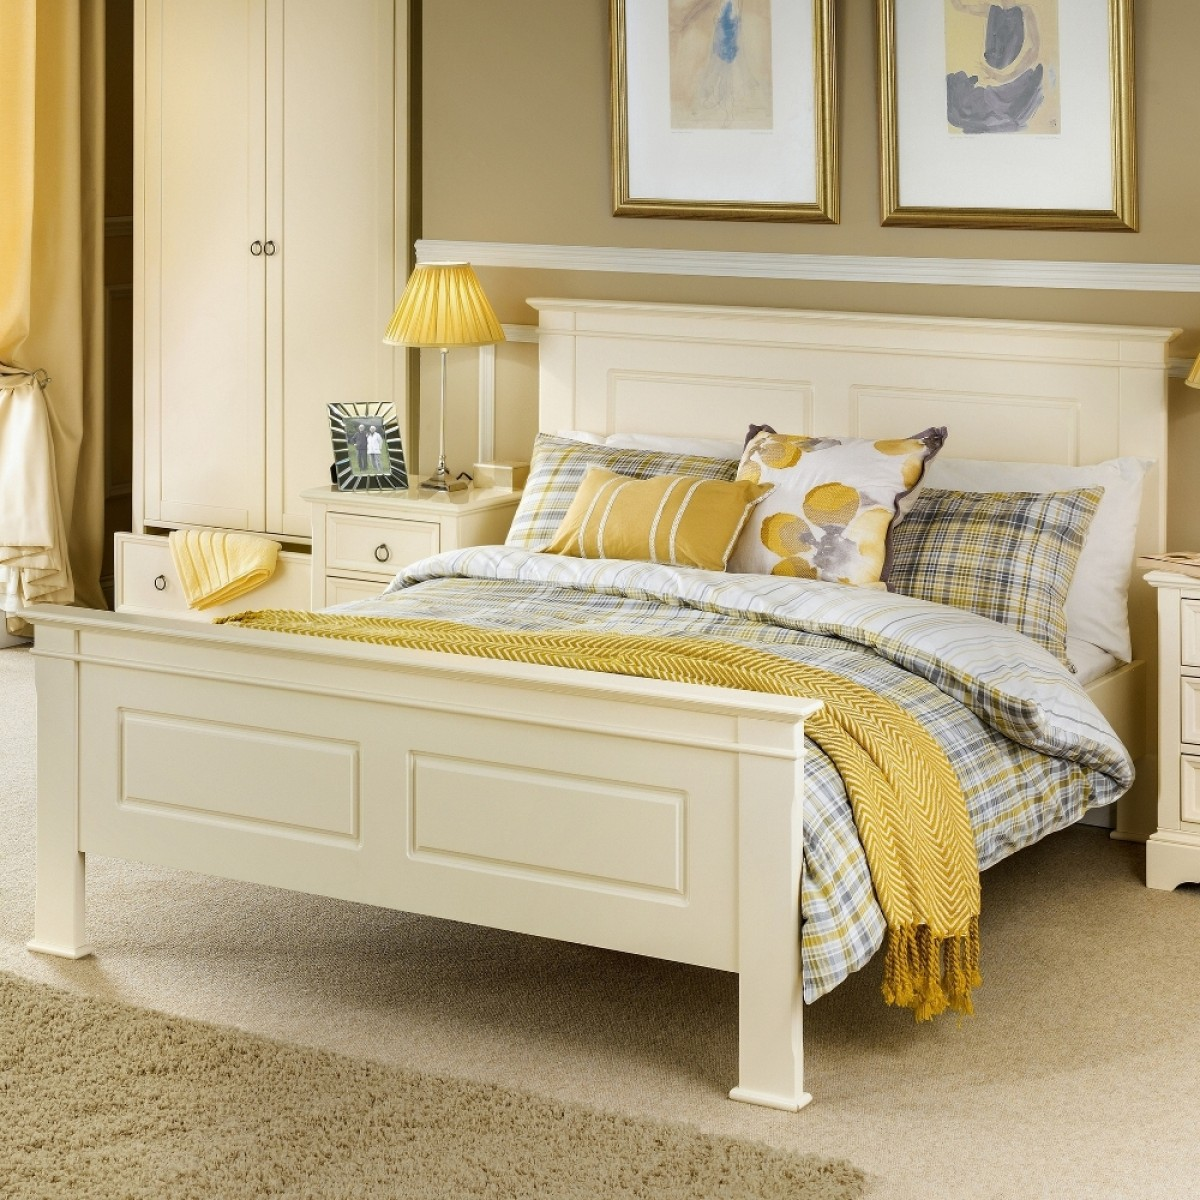 La Rochelle Stone White Wooden Bed